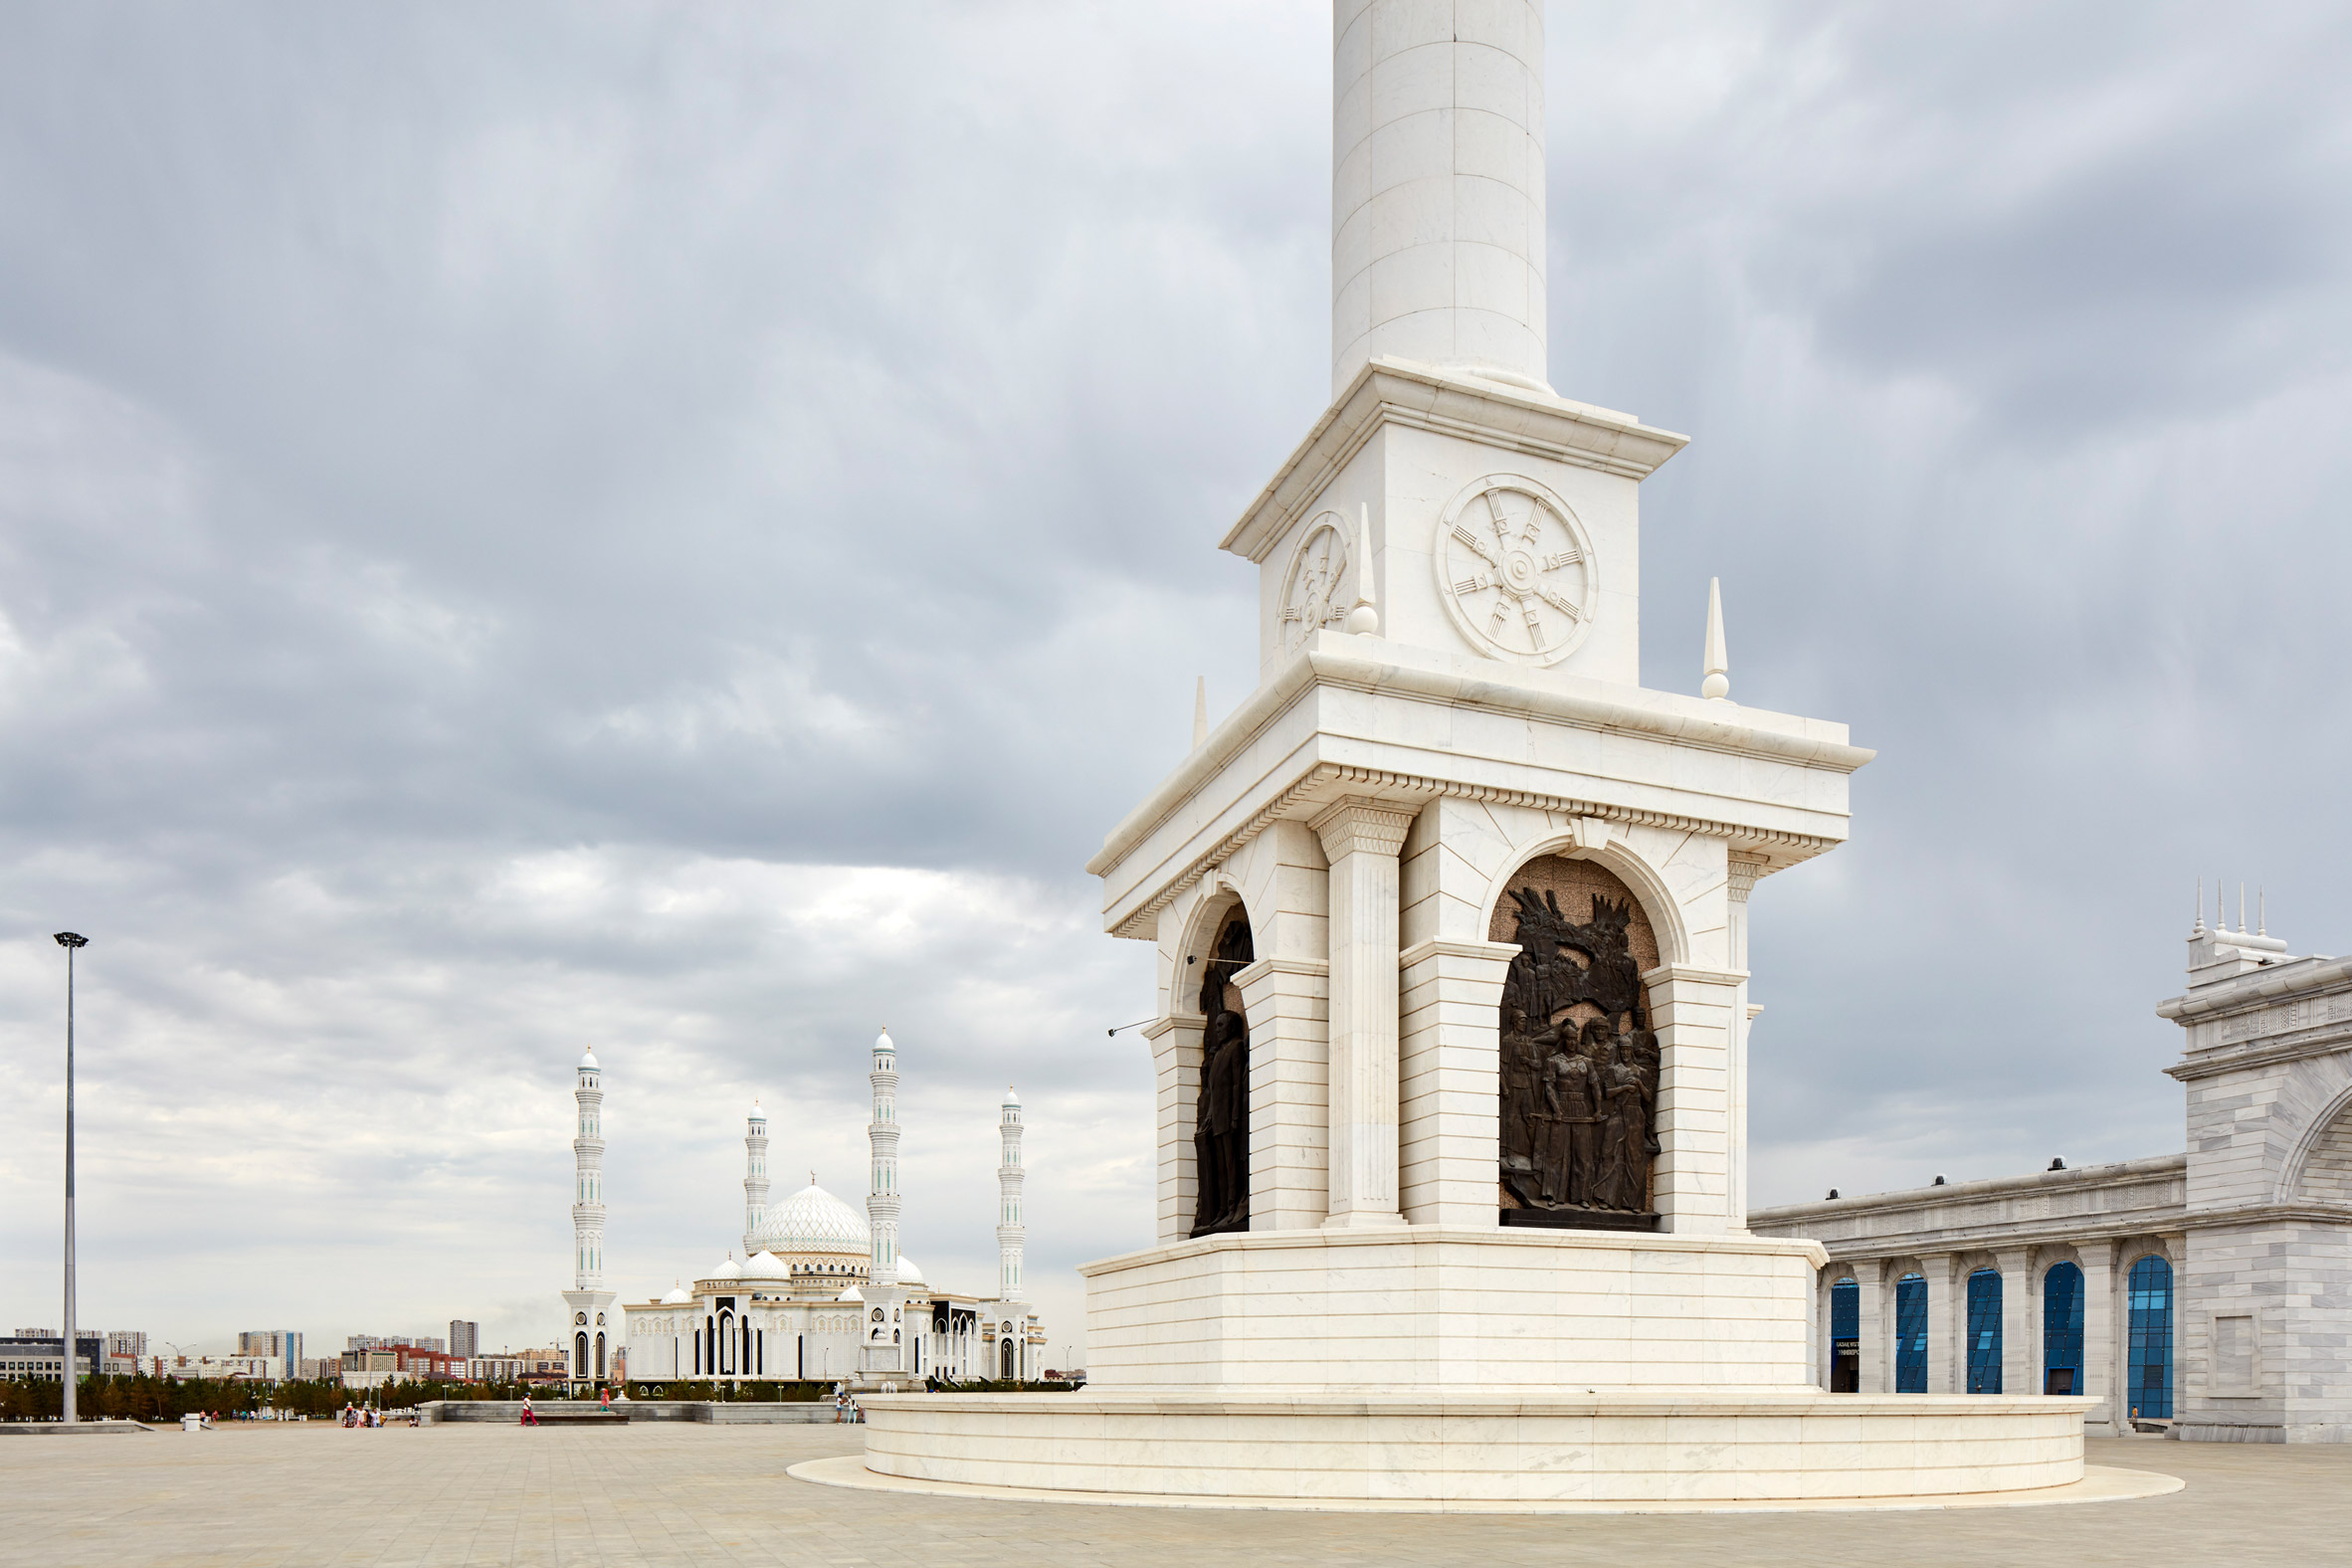 Paul Raftery photographs Astana post-Communism